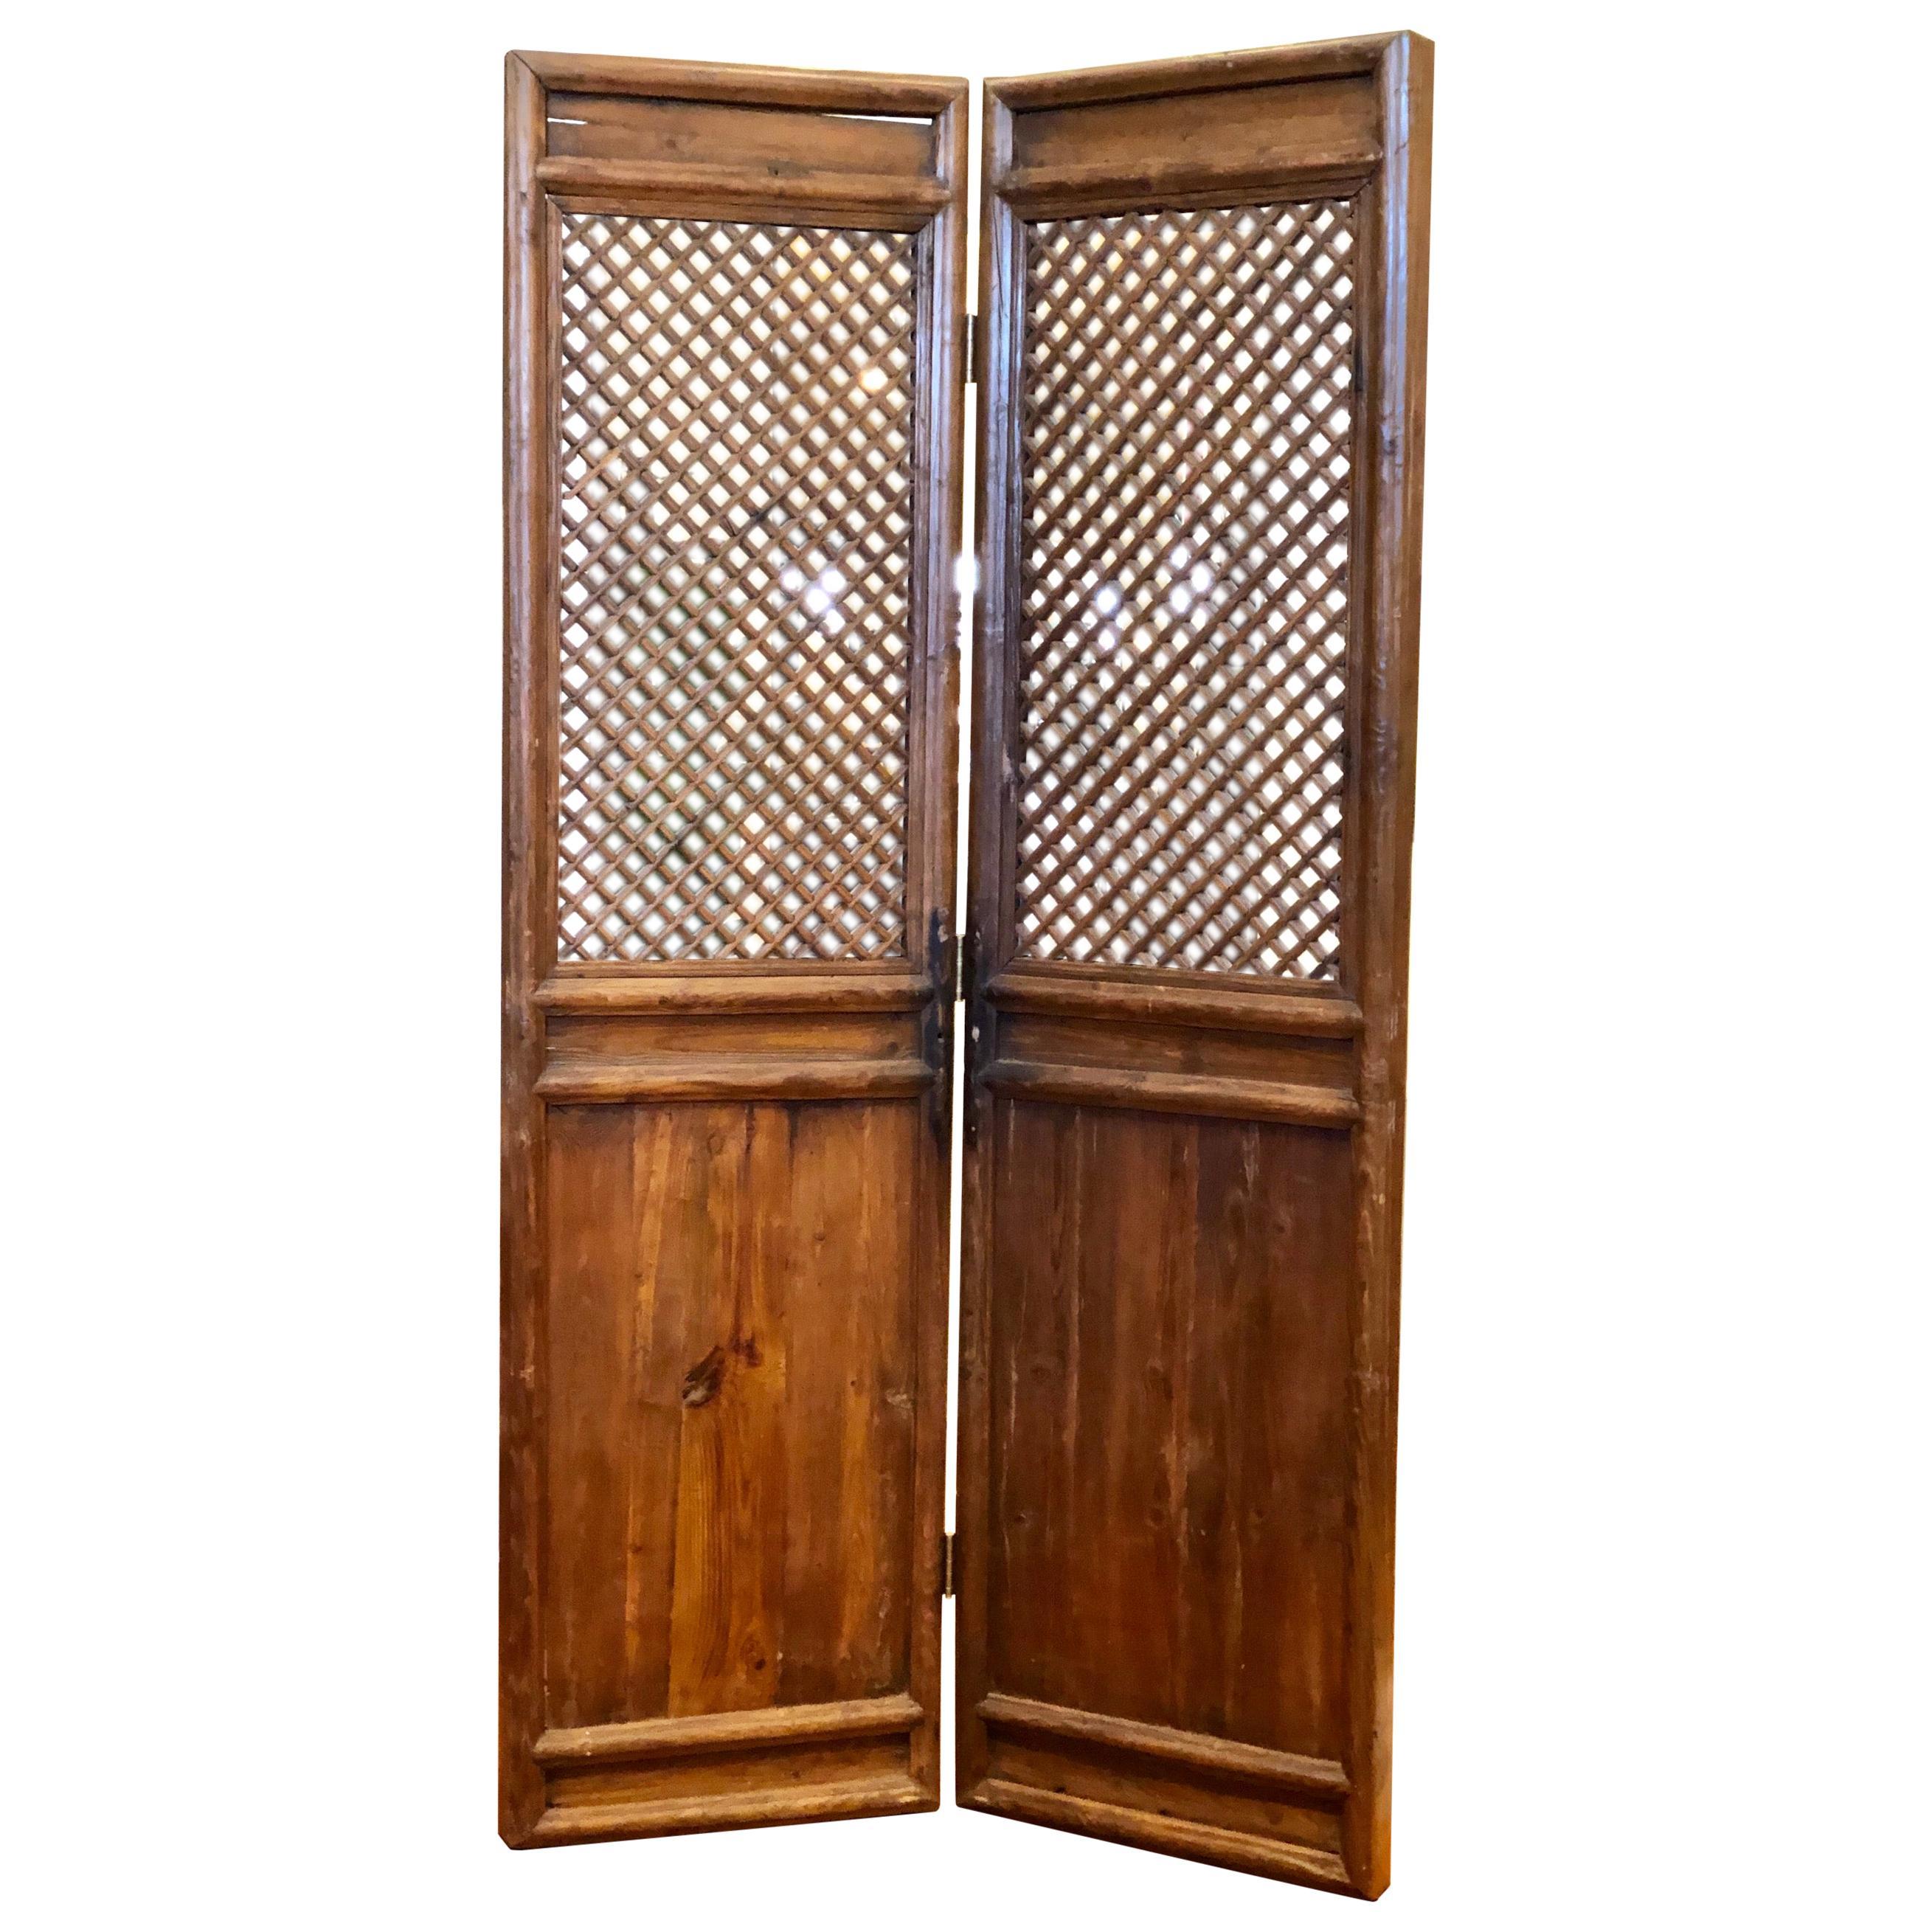 Pair of Antique Massive Tall Rustic Doors Wall Panels Room Dividers Screen